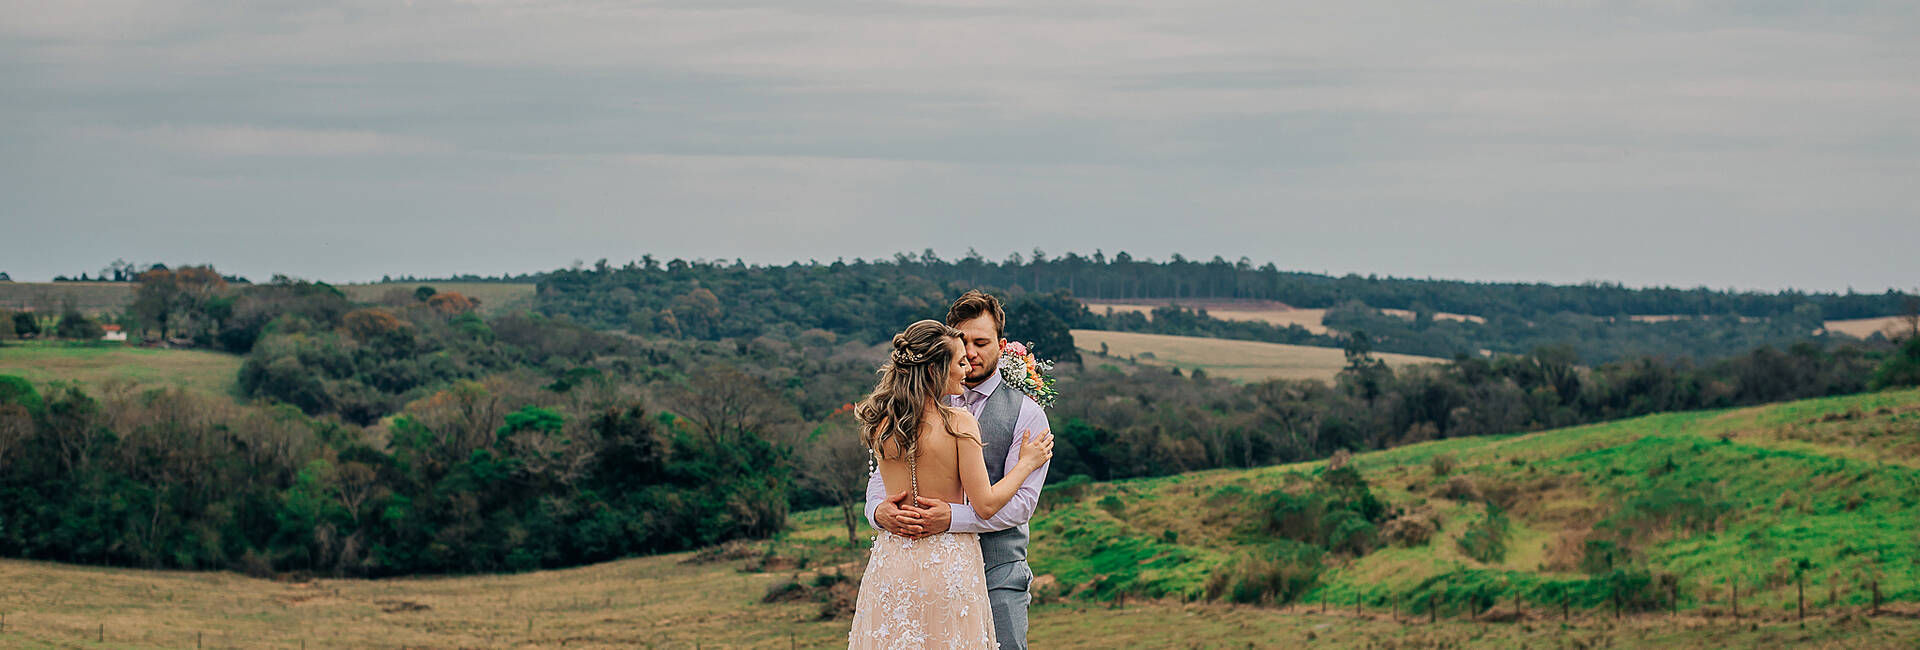 Casamento de Larissa e Pablo